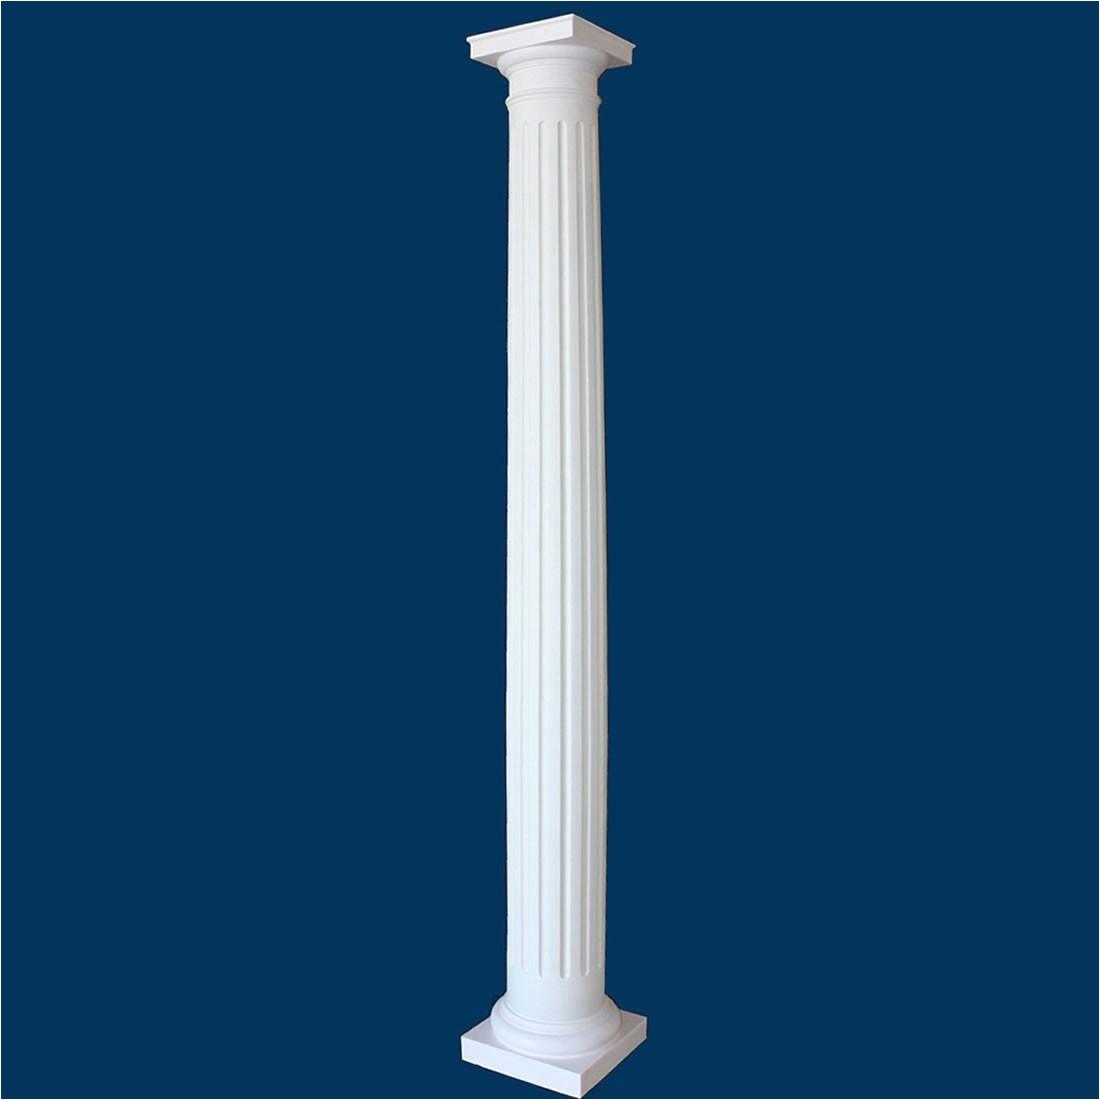 Interior Round Column Wraps Buy Porch Columns to Renovate Your Porch or Patio